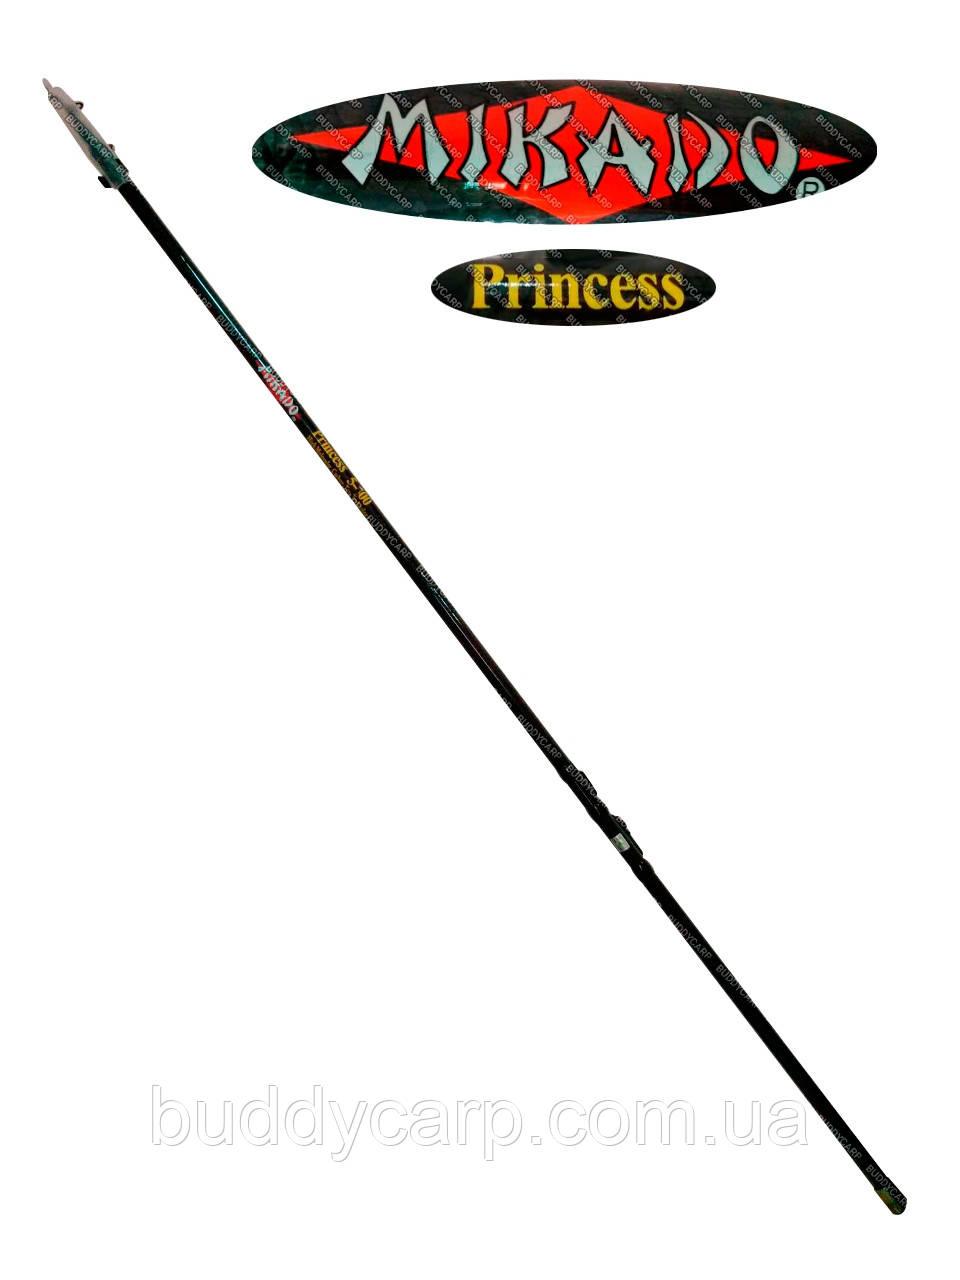 Удочка 6 метров тест 10-30 гр Mikado Princess с кольцами